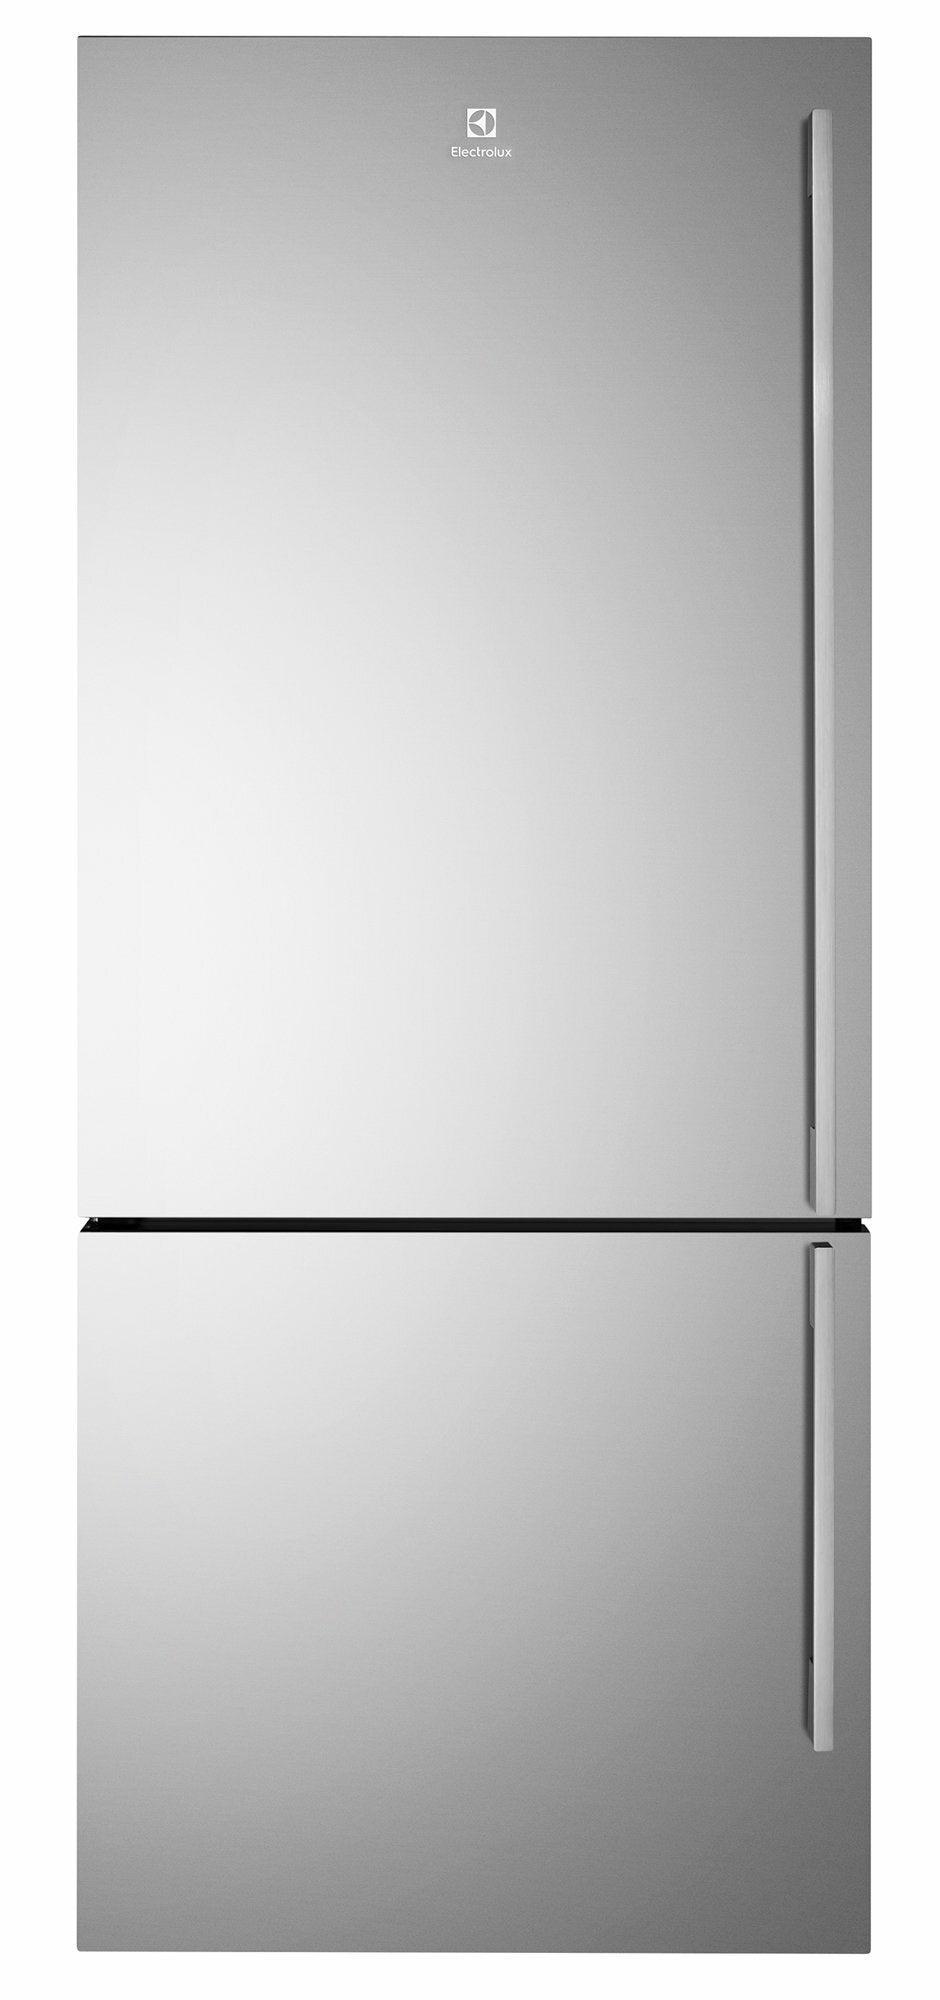 Electrolux EBE4507SC-R Refrigerator